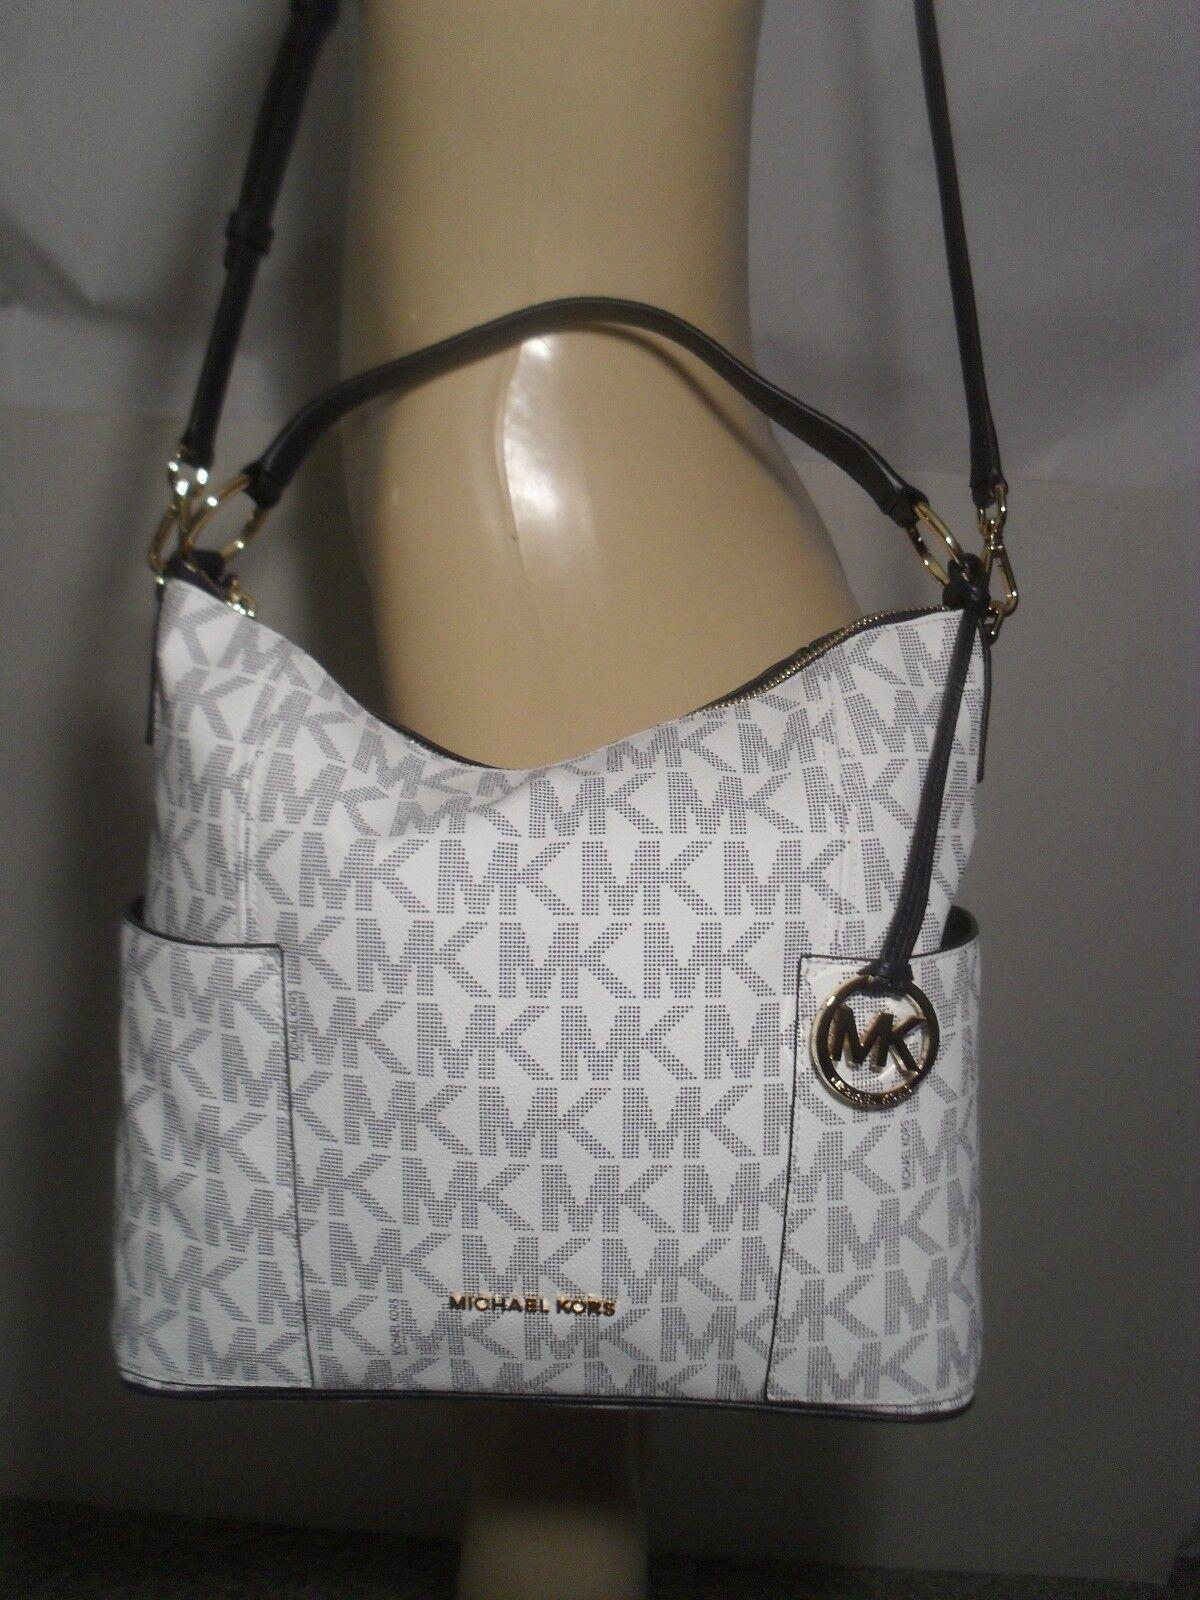 Michael Kors - NWT Michael Kors Anita Navy White Vanilla PVC Large Convertible Shoulder MK Bag